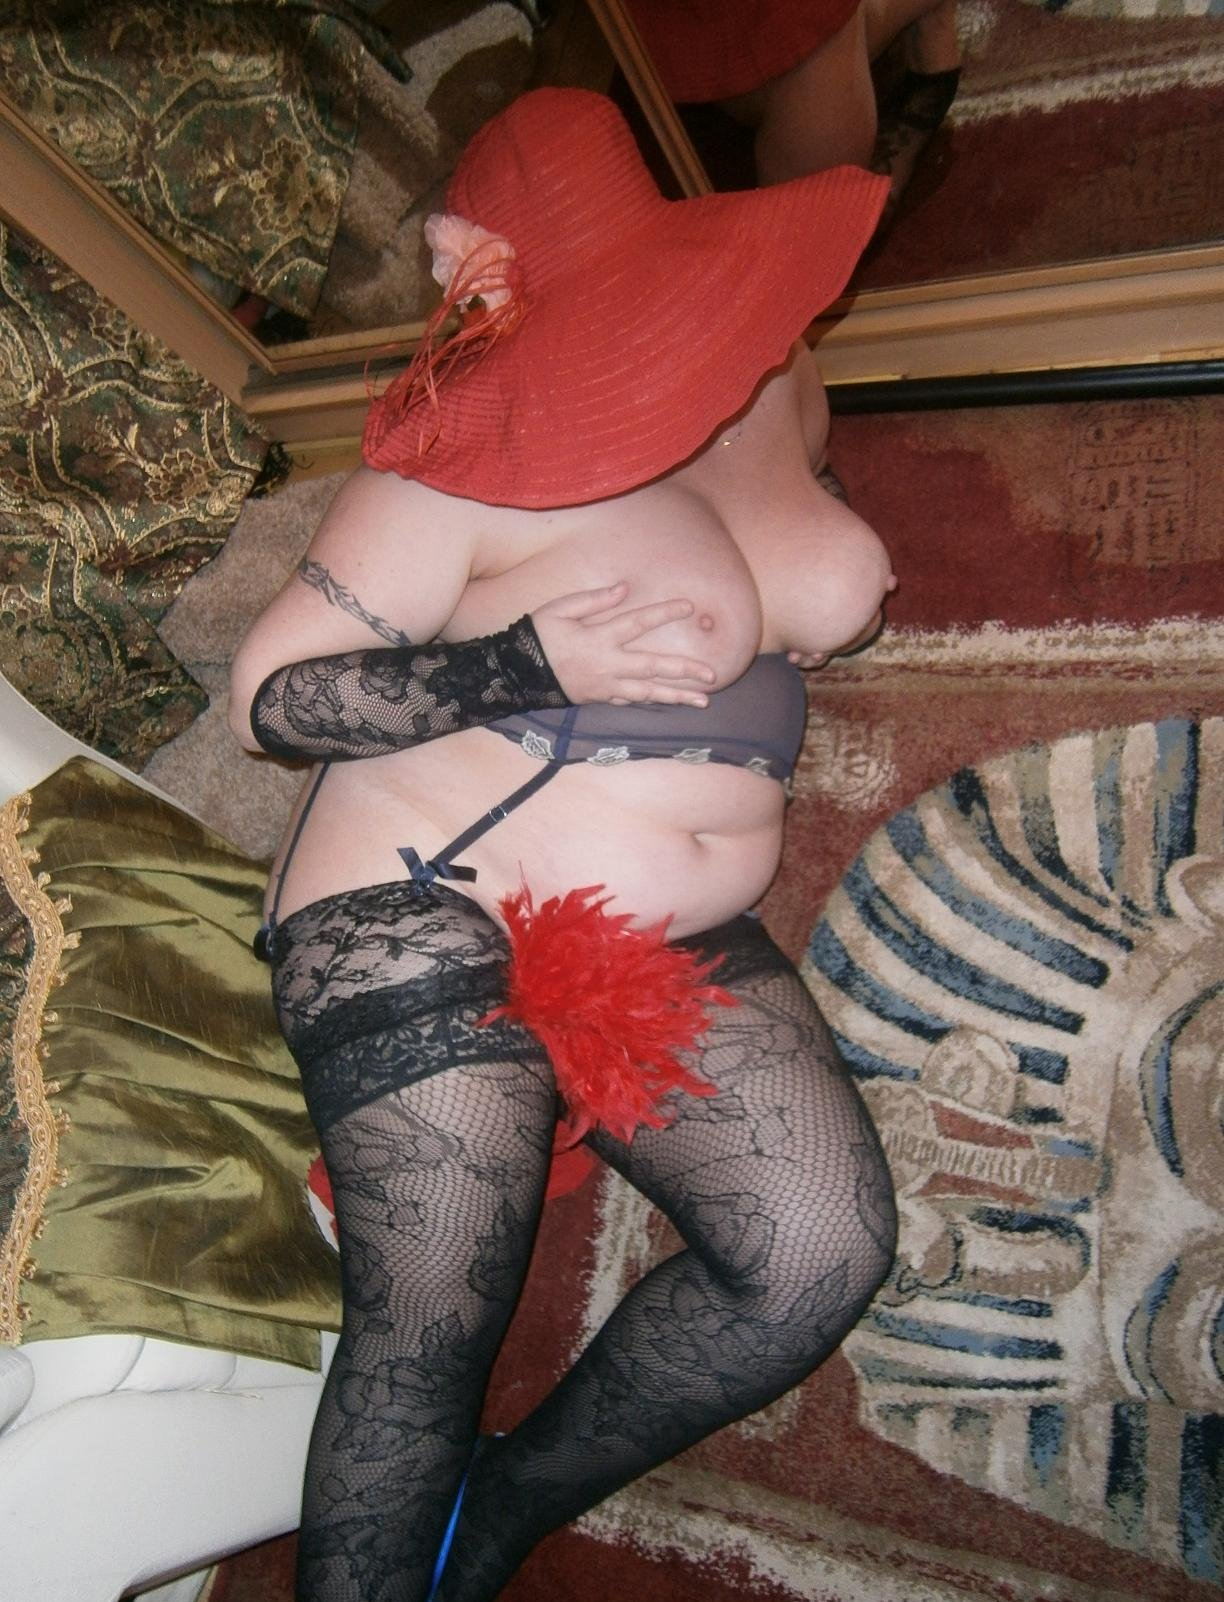 Найти Проституток Нижний Новгород